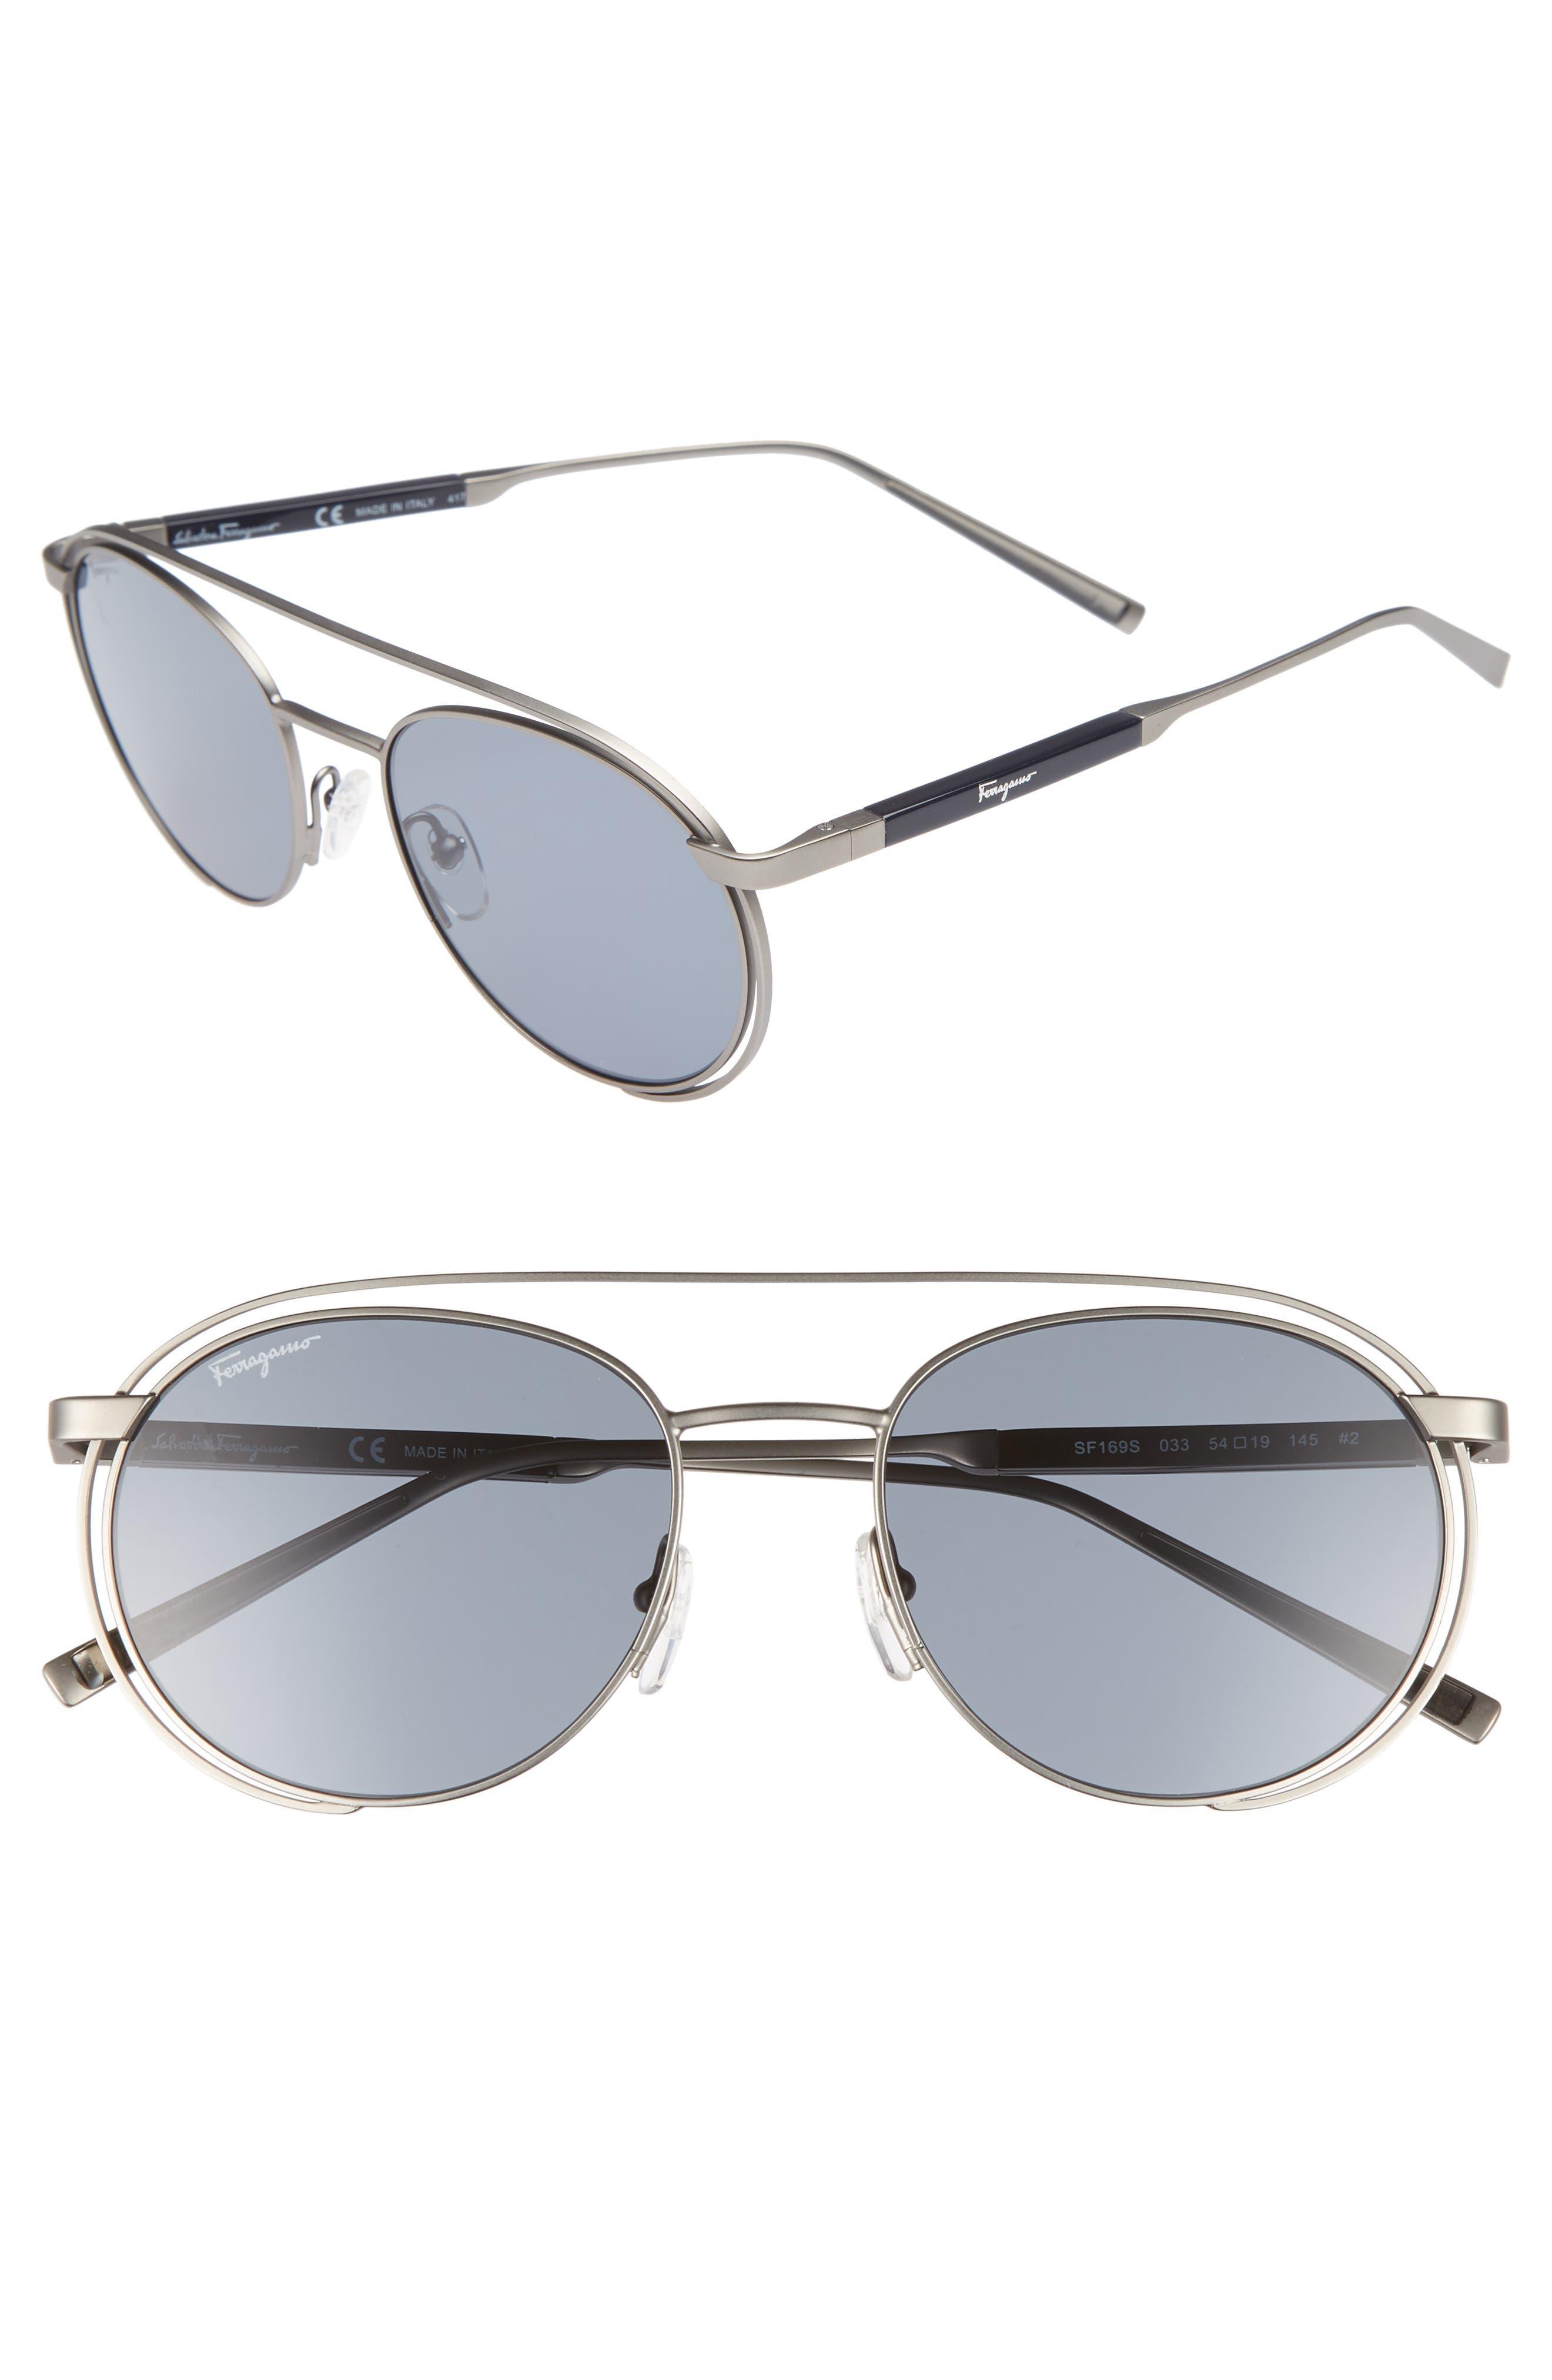 54mm Round Sunglasses,                             Main thumbnail 1, color,                             Matte Gunmetal